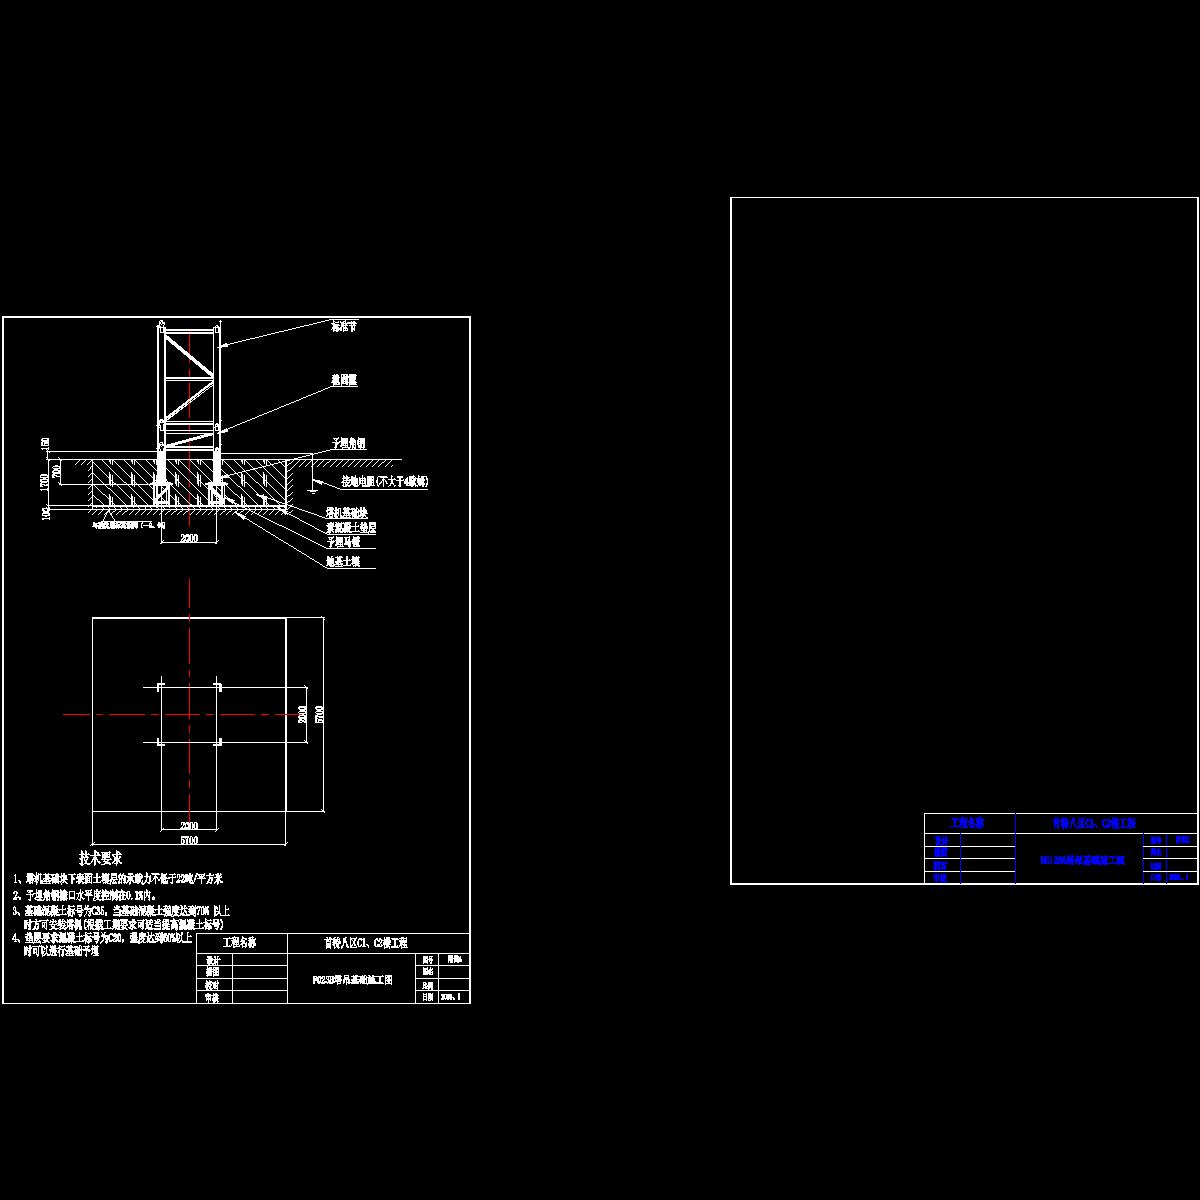 f023b塔吊基础施工图.dwg